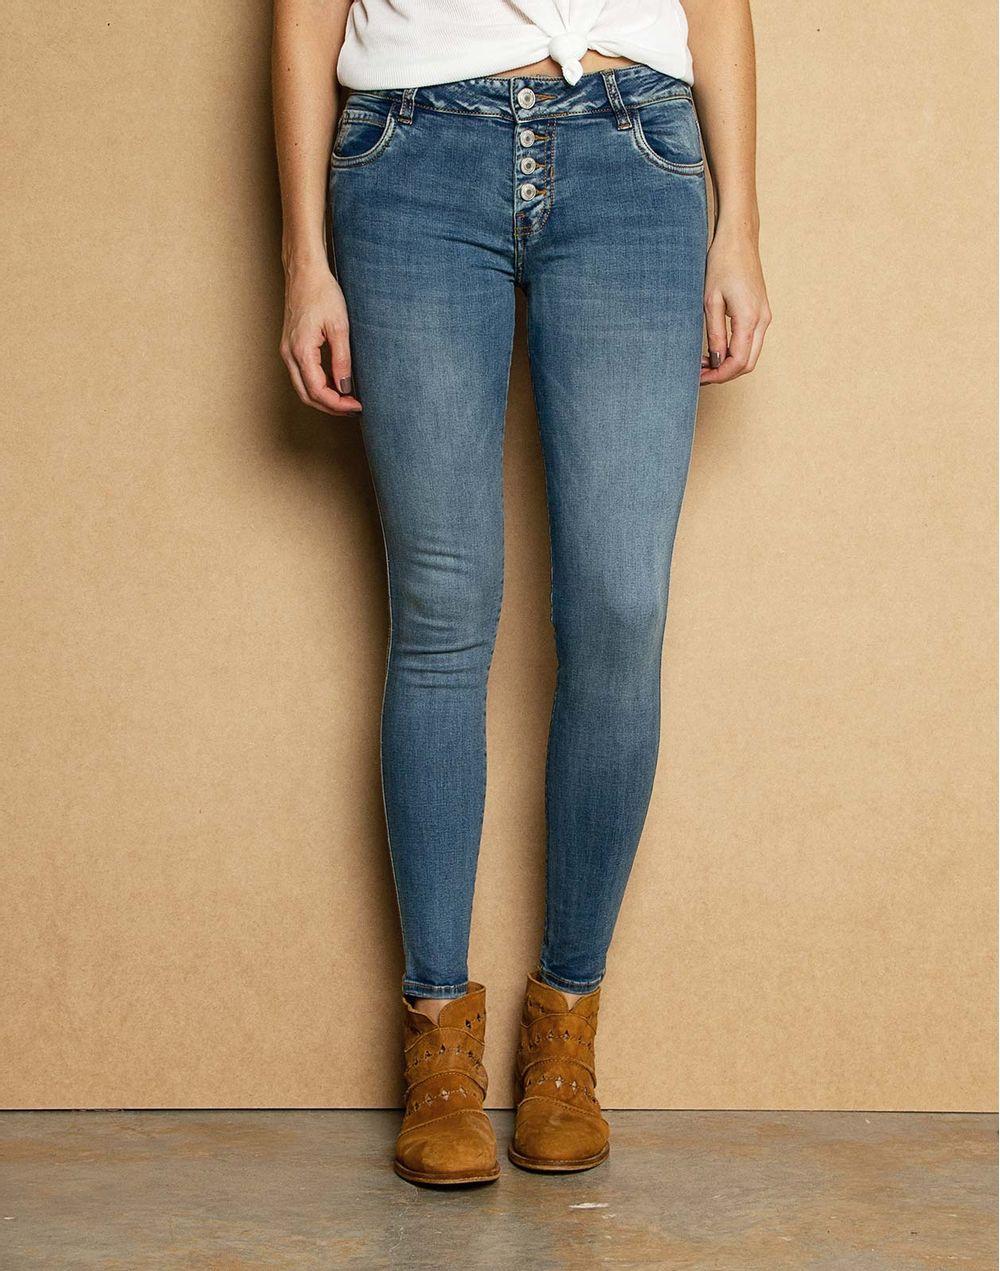 0b55faf01f6 Low Waist Skinny Jeans Botones Externos Azul 14 Compra en tienda ...